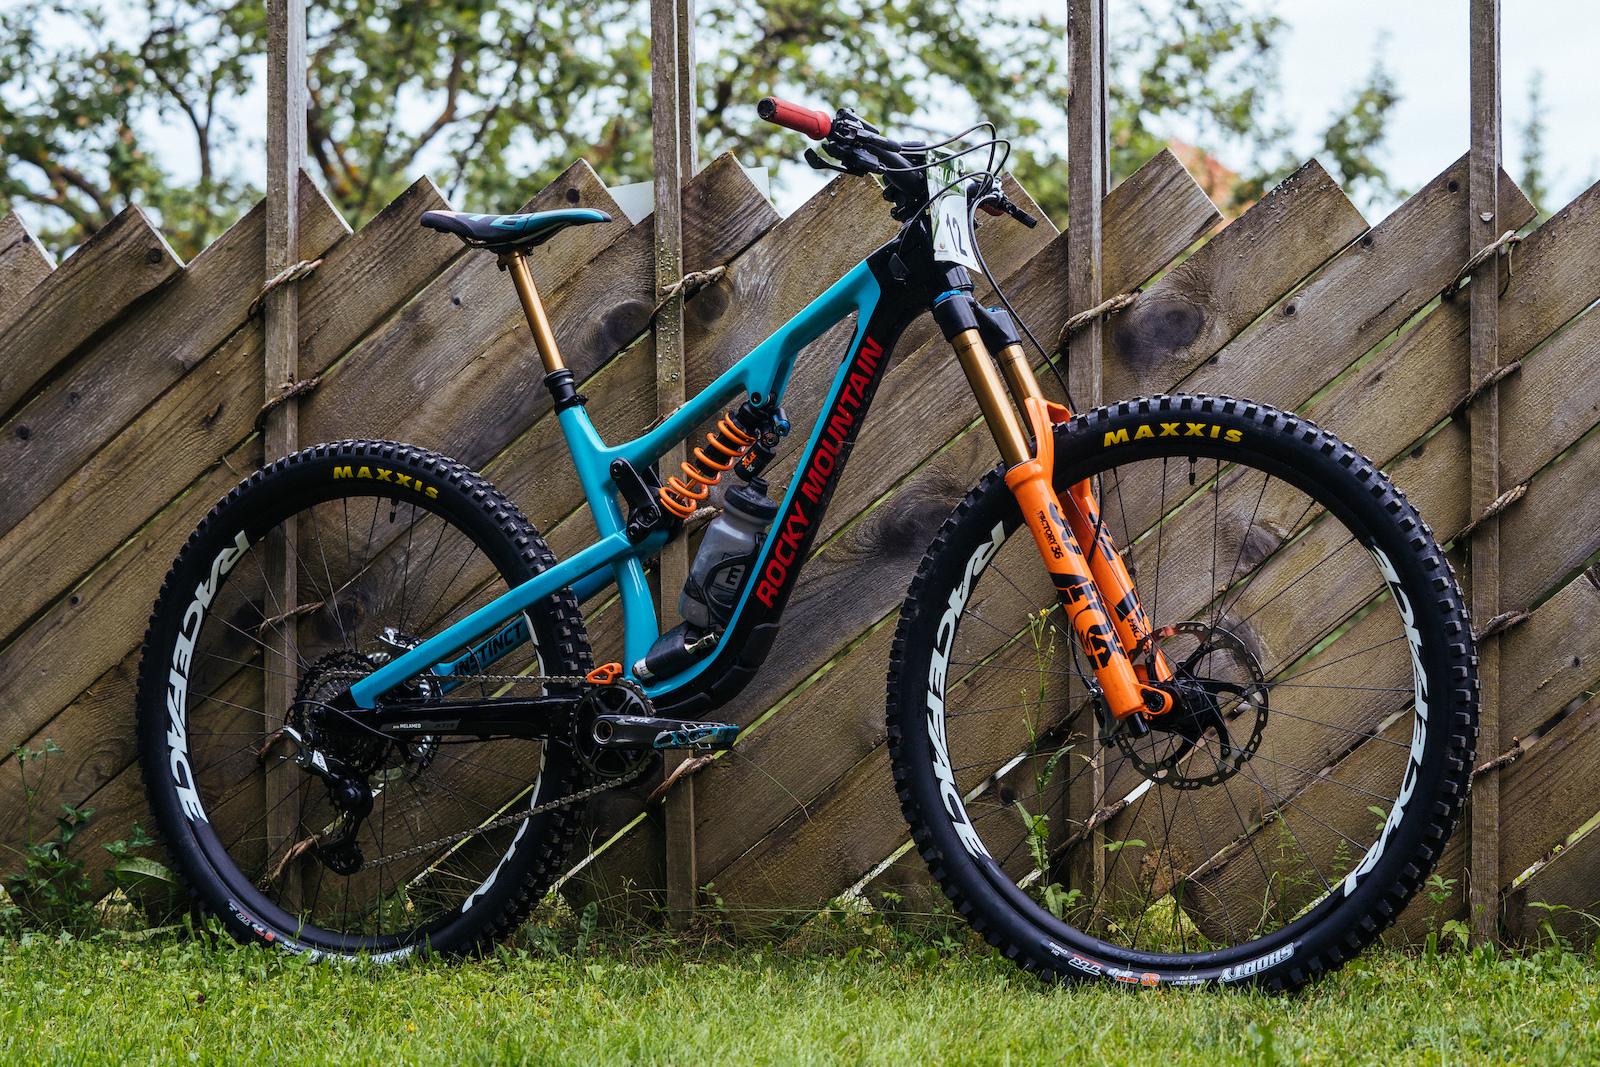 92065e7c906 Bike Check: Jesse Melamed's Rocky Mountain Instinct - EWS Petzen ...